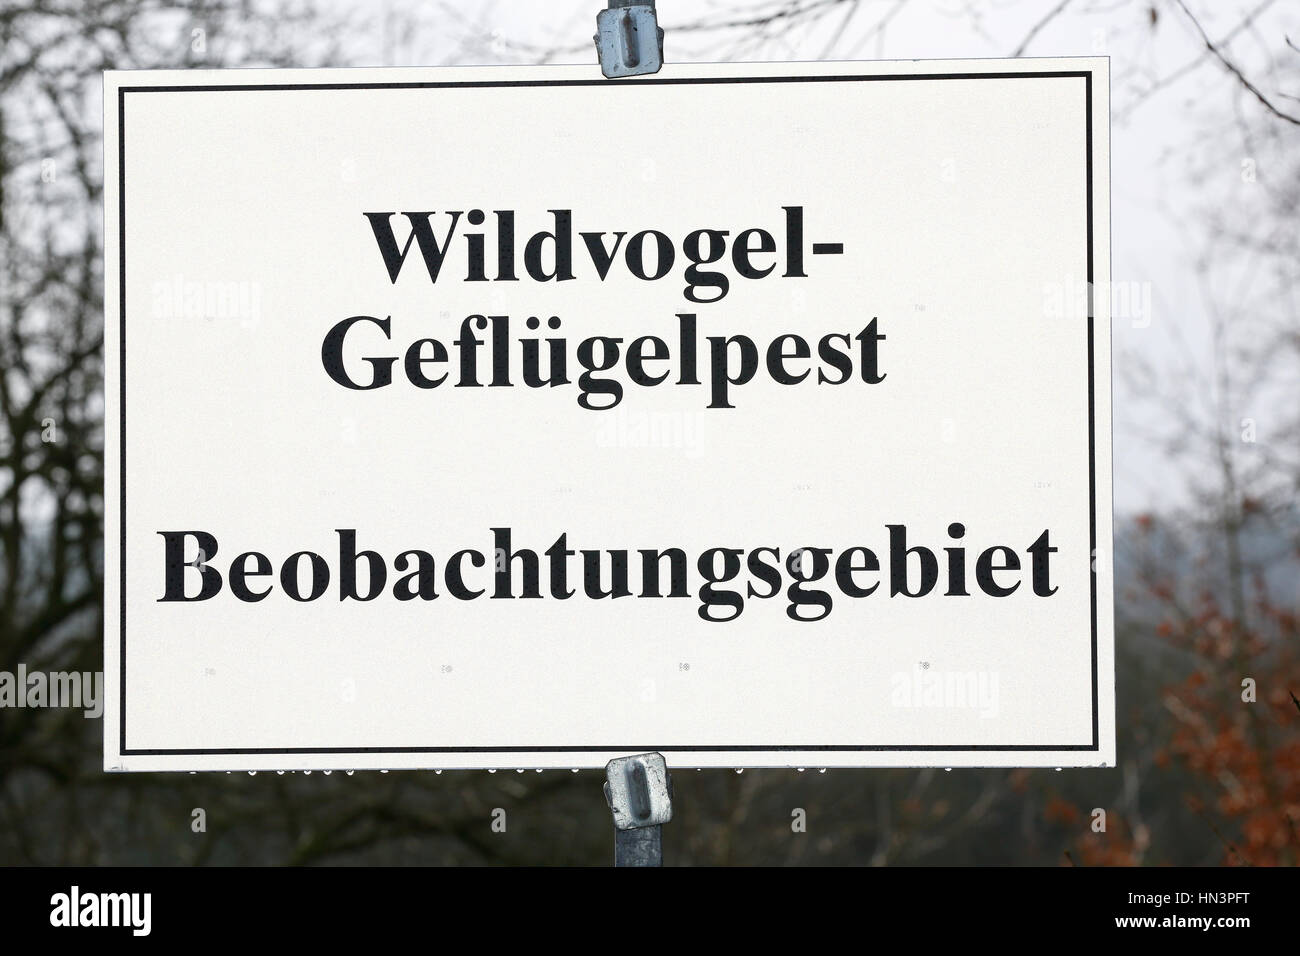 Warning sign bird flu, avian influenza surveillance area, Pinneberg, Schleswig-Holstein, Germany - Stock Image